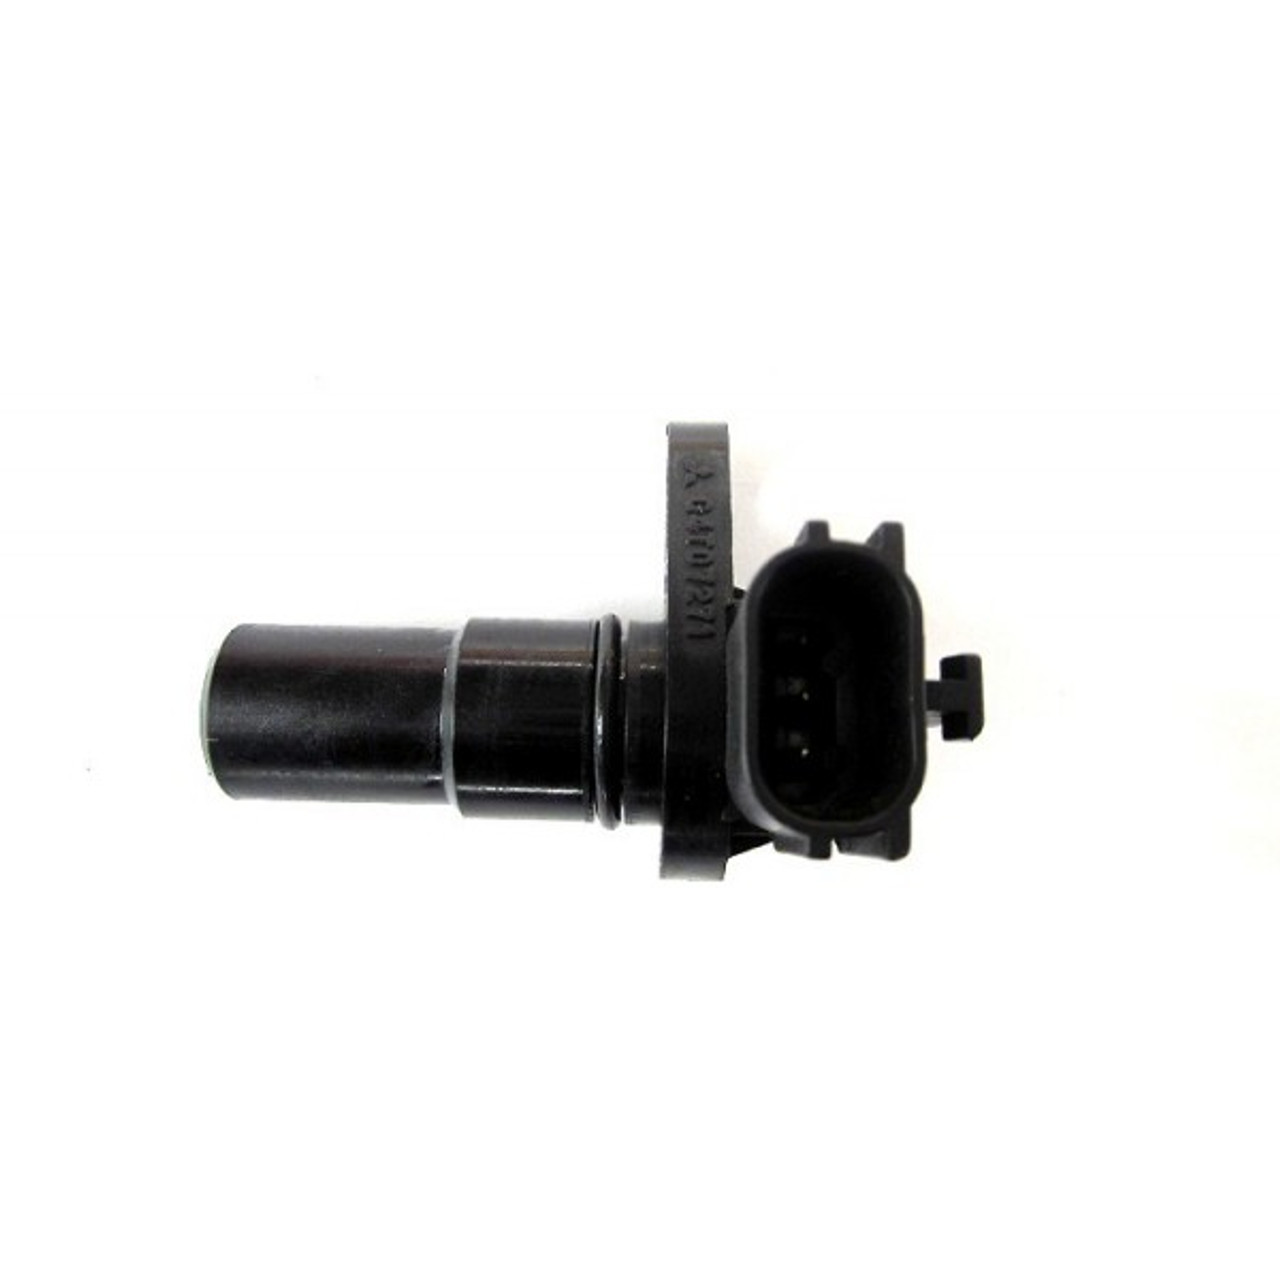 Primary Pulley speed sensor REOF06 (jf006 )